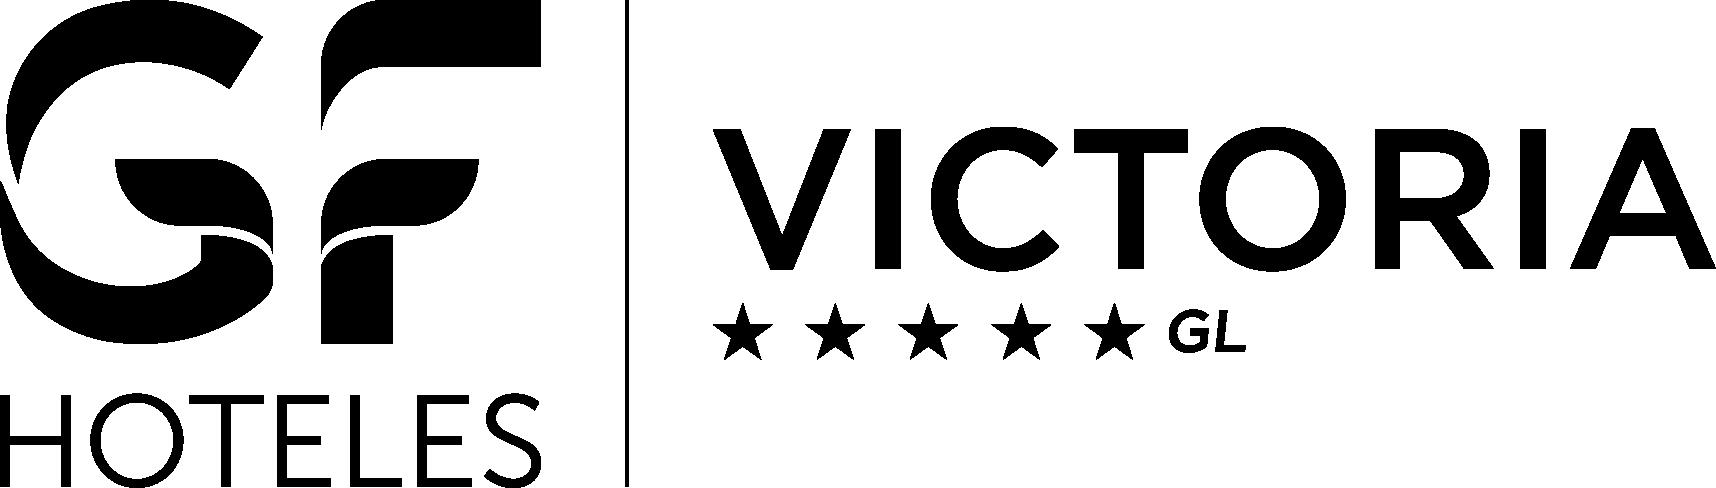 GF VICTORIA